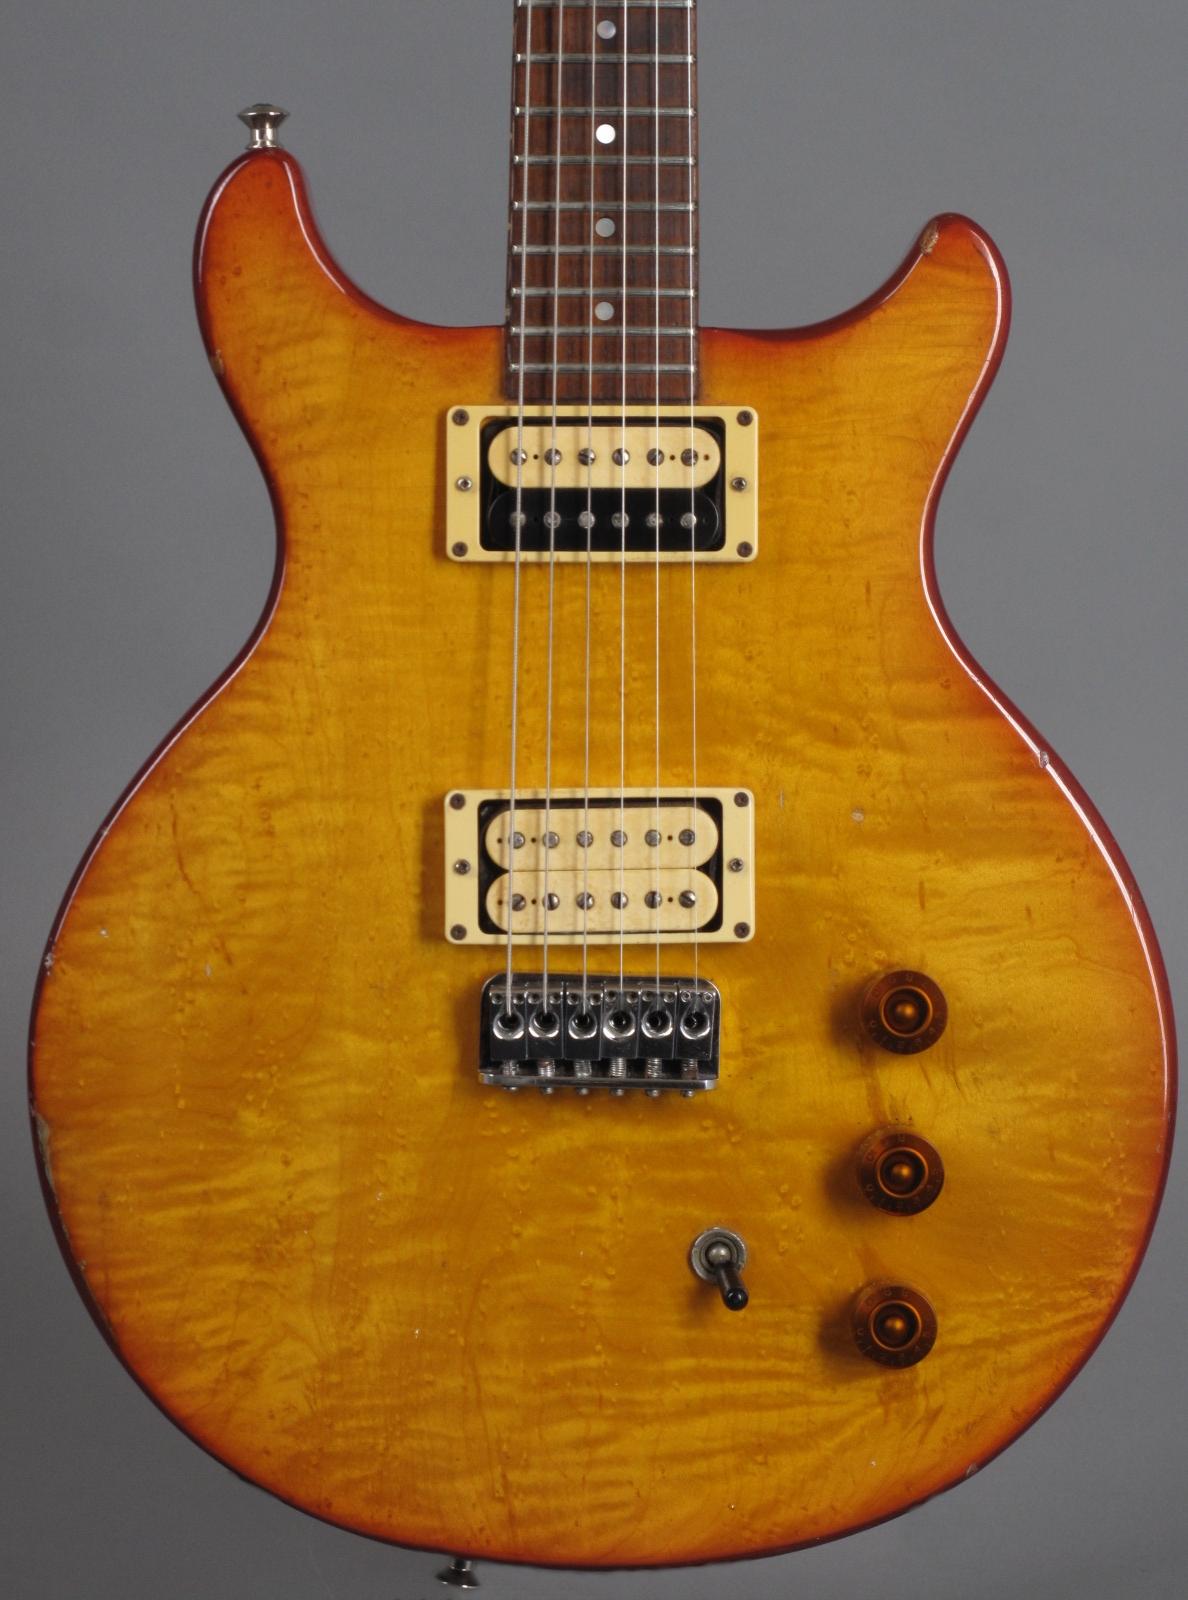 1980 Hamer Special - Sunburst